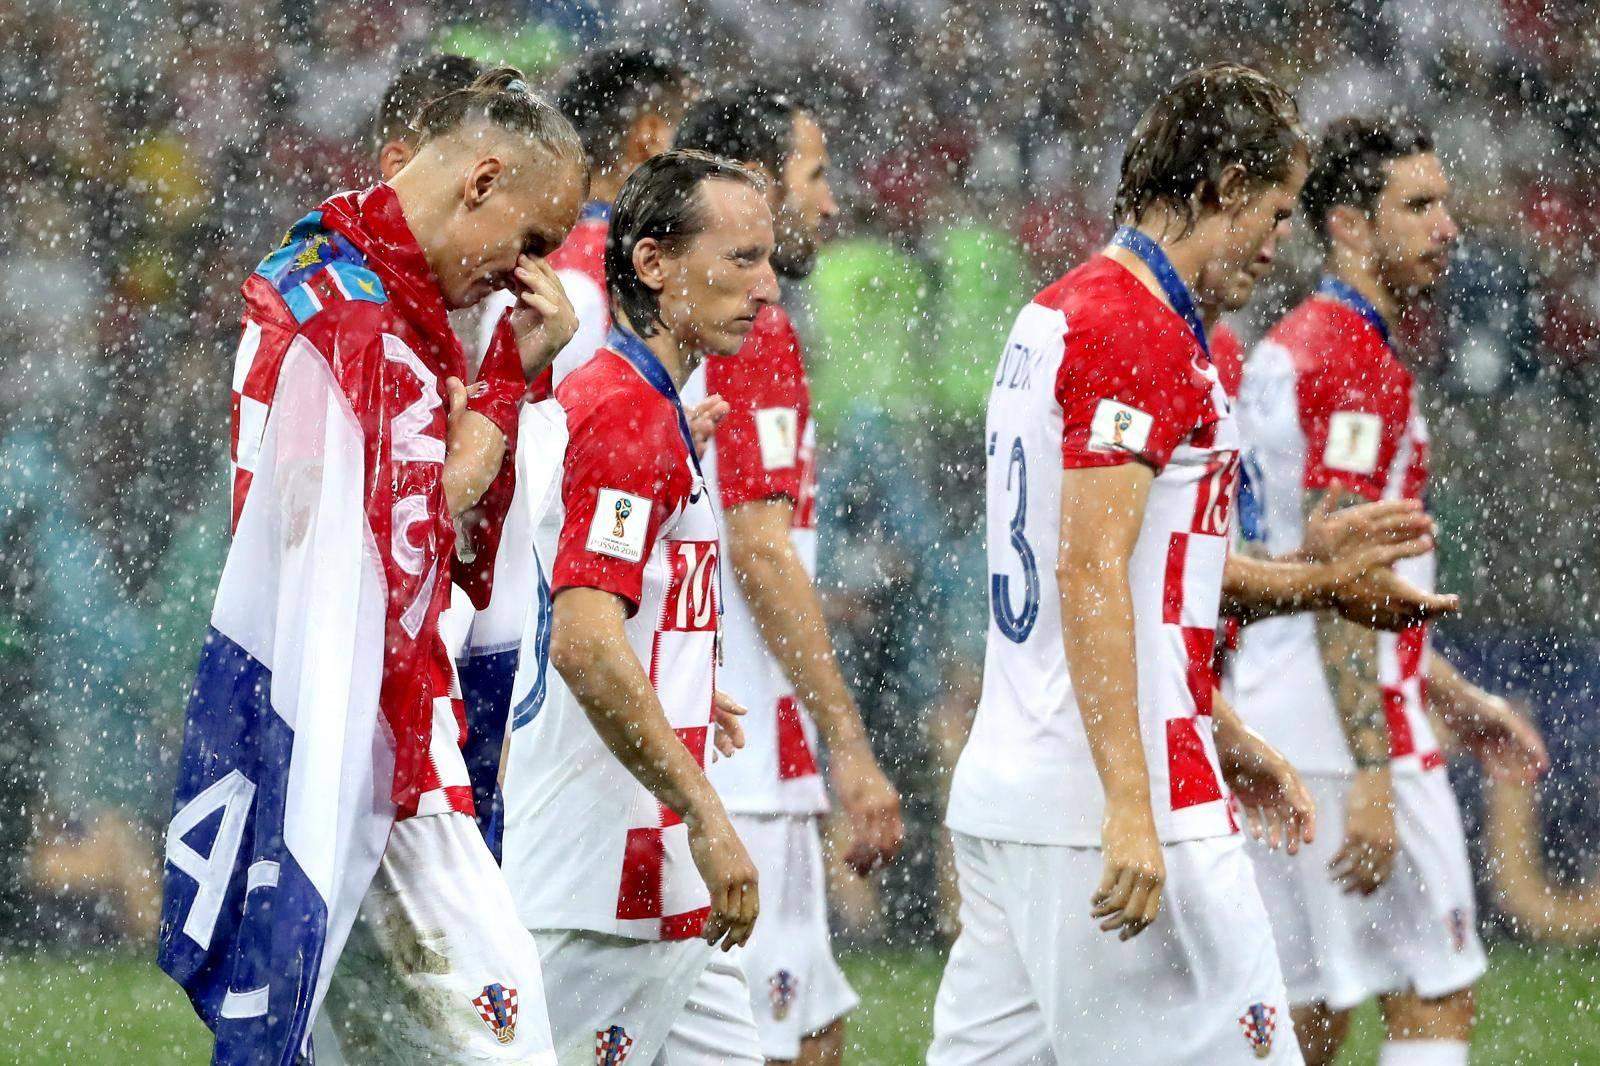 I nebo je plakalo za Hrvatskom, a presretna Kolinda grlila sve...